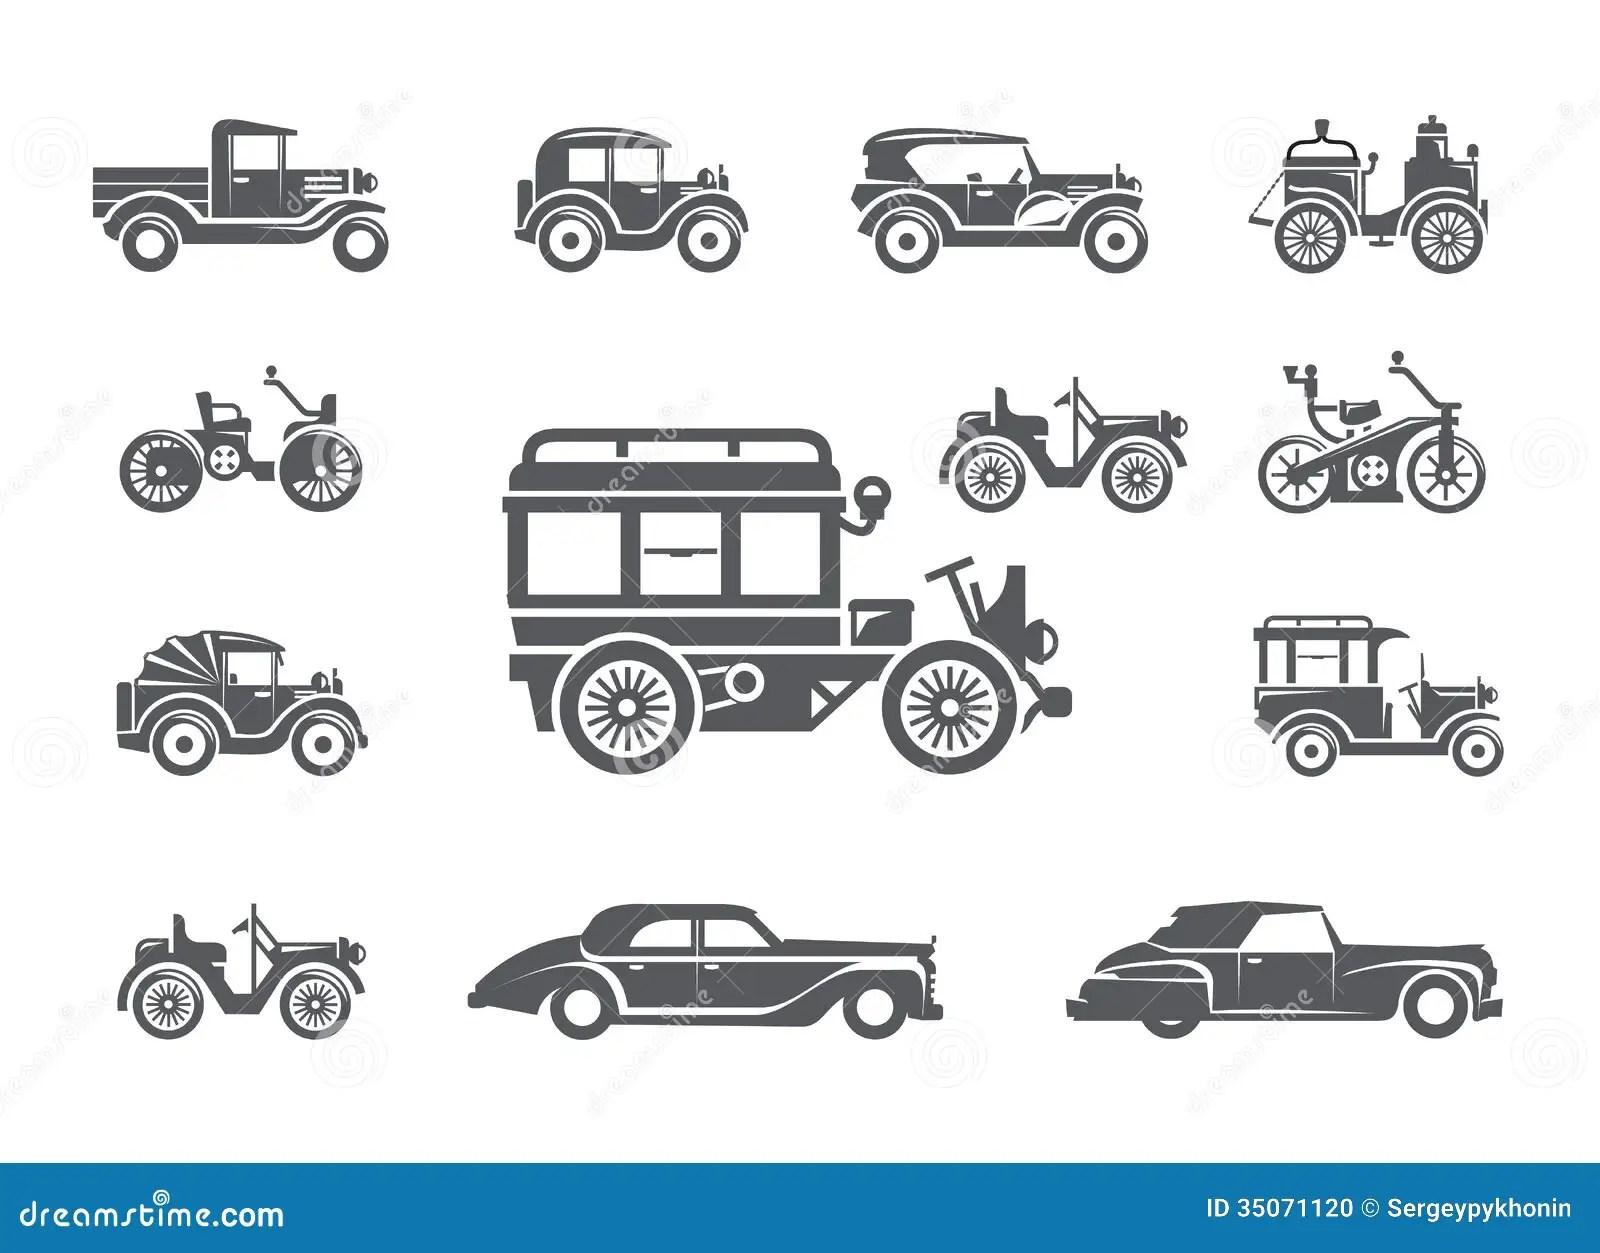 Vintage Cars Icons Set Stock Photo